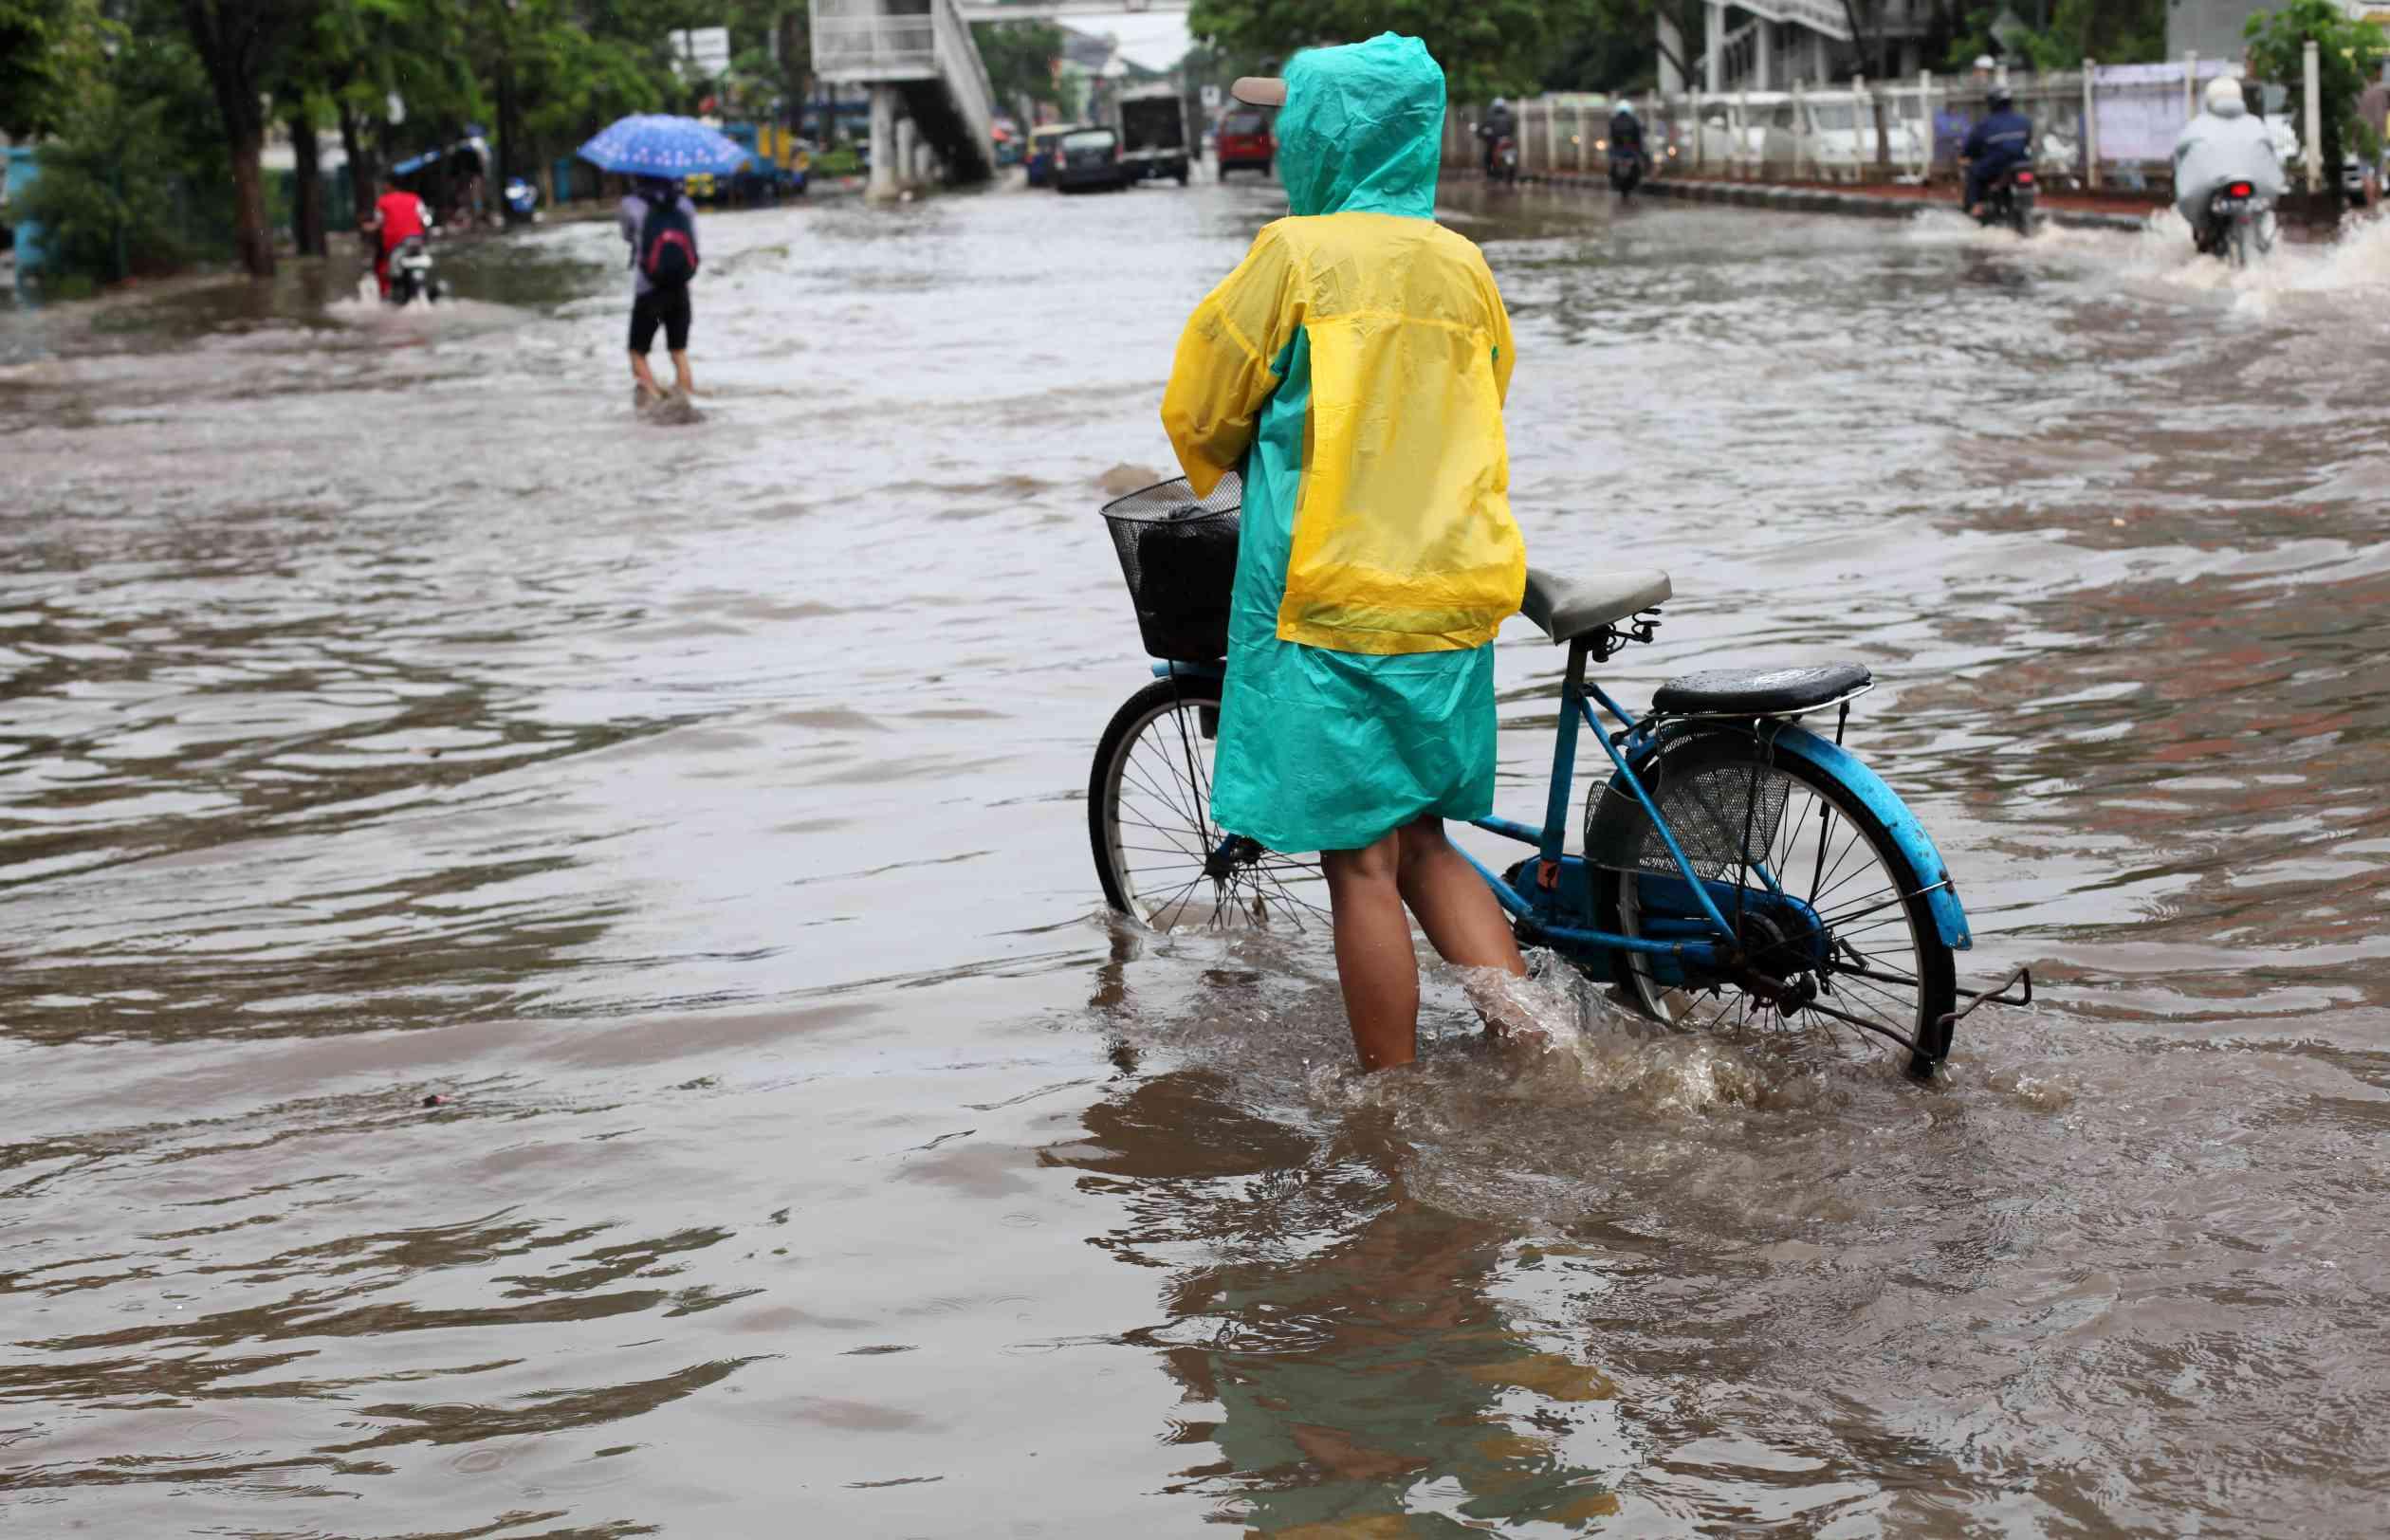 Flood in the Street